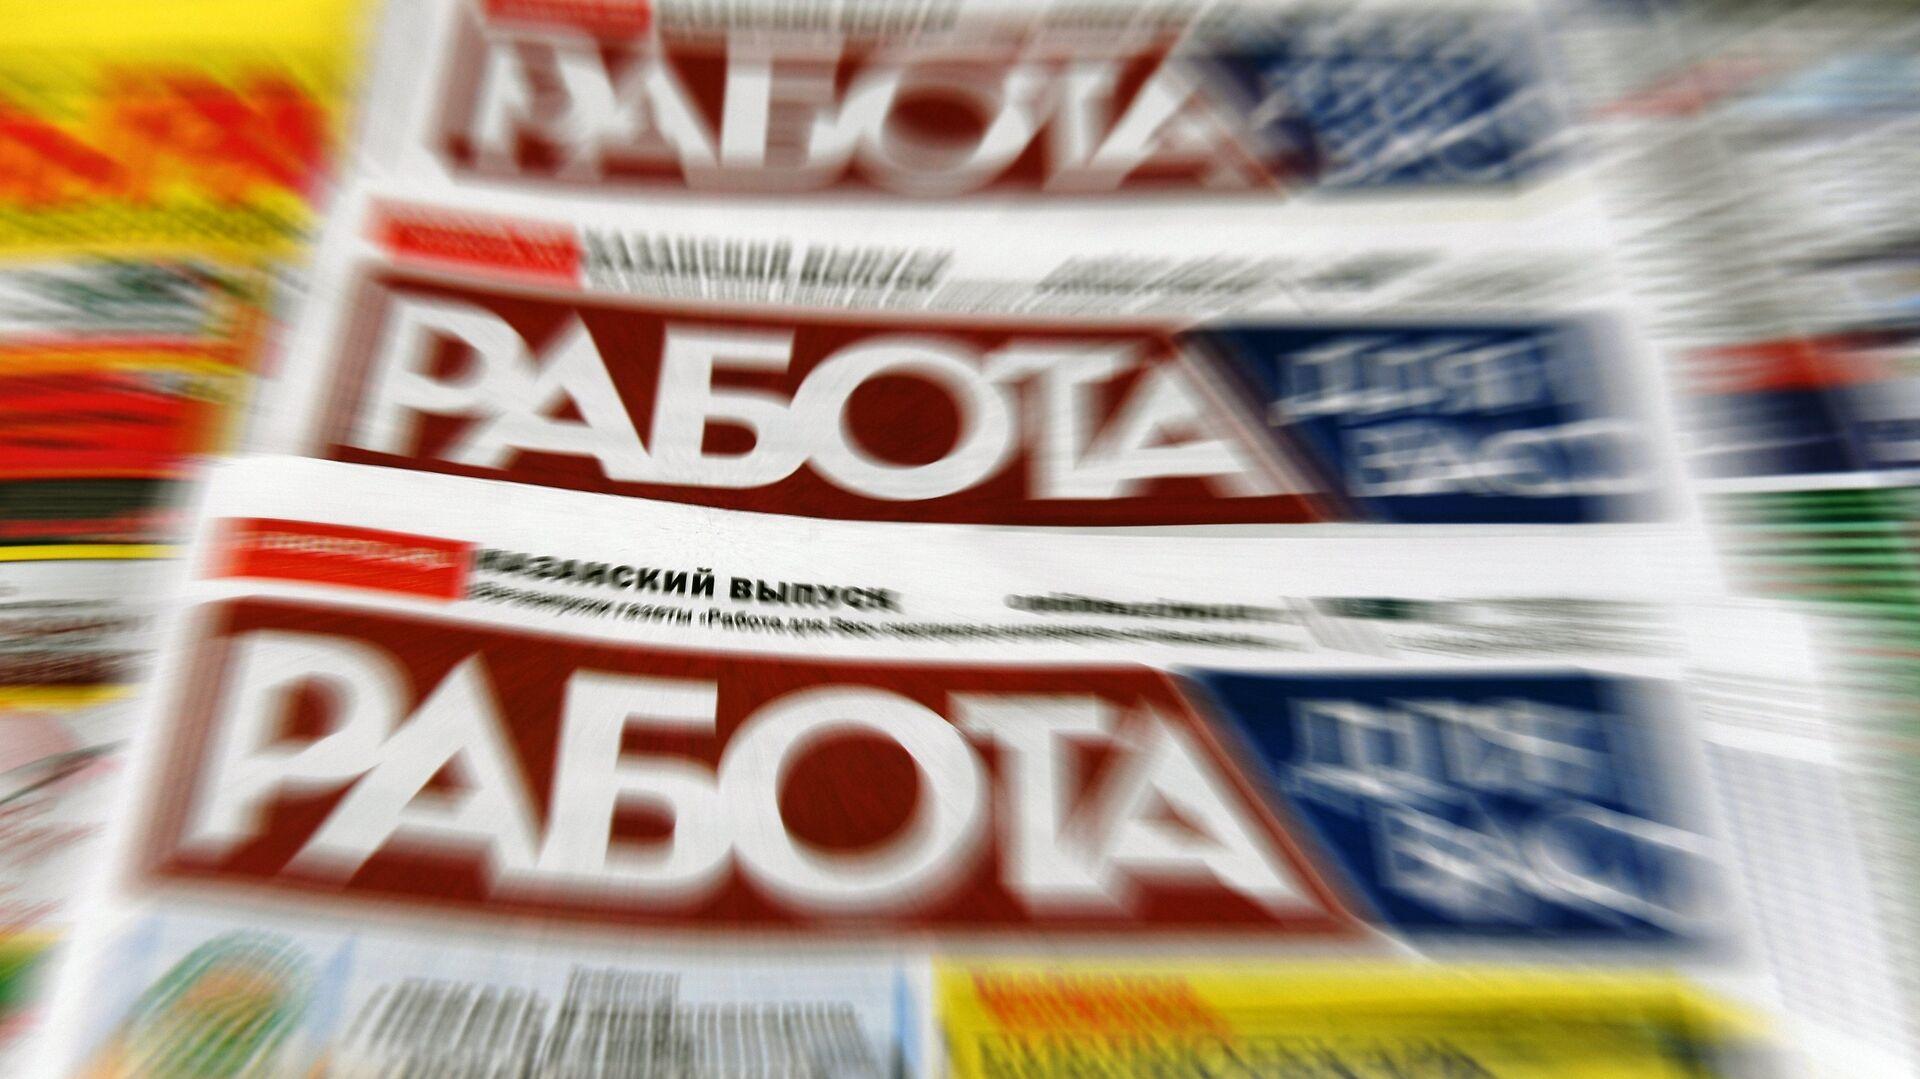 Газета Работа на ярмарке вакансий - РИА Новости, 1920, 25.02.2021